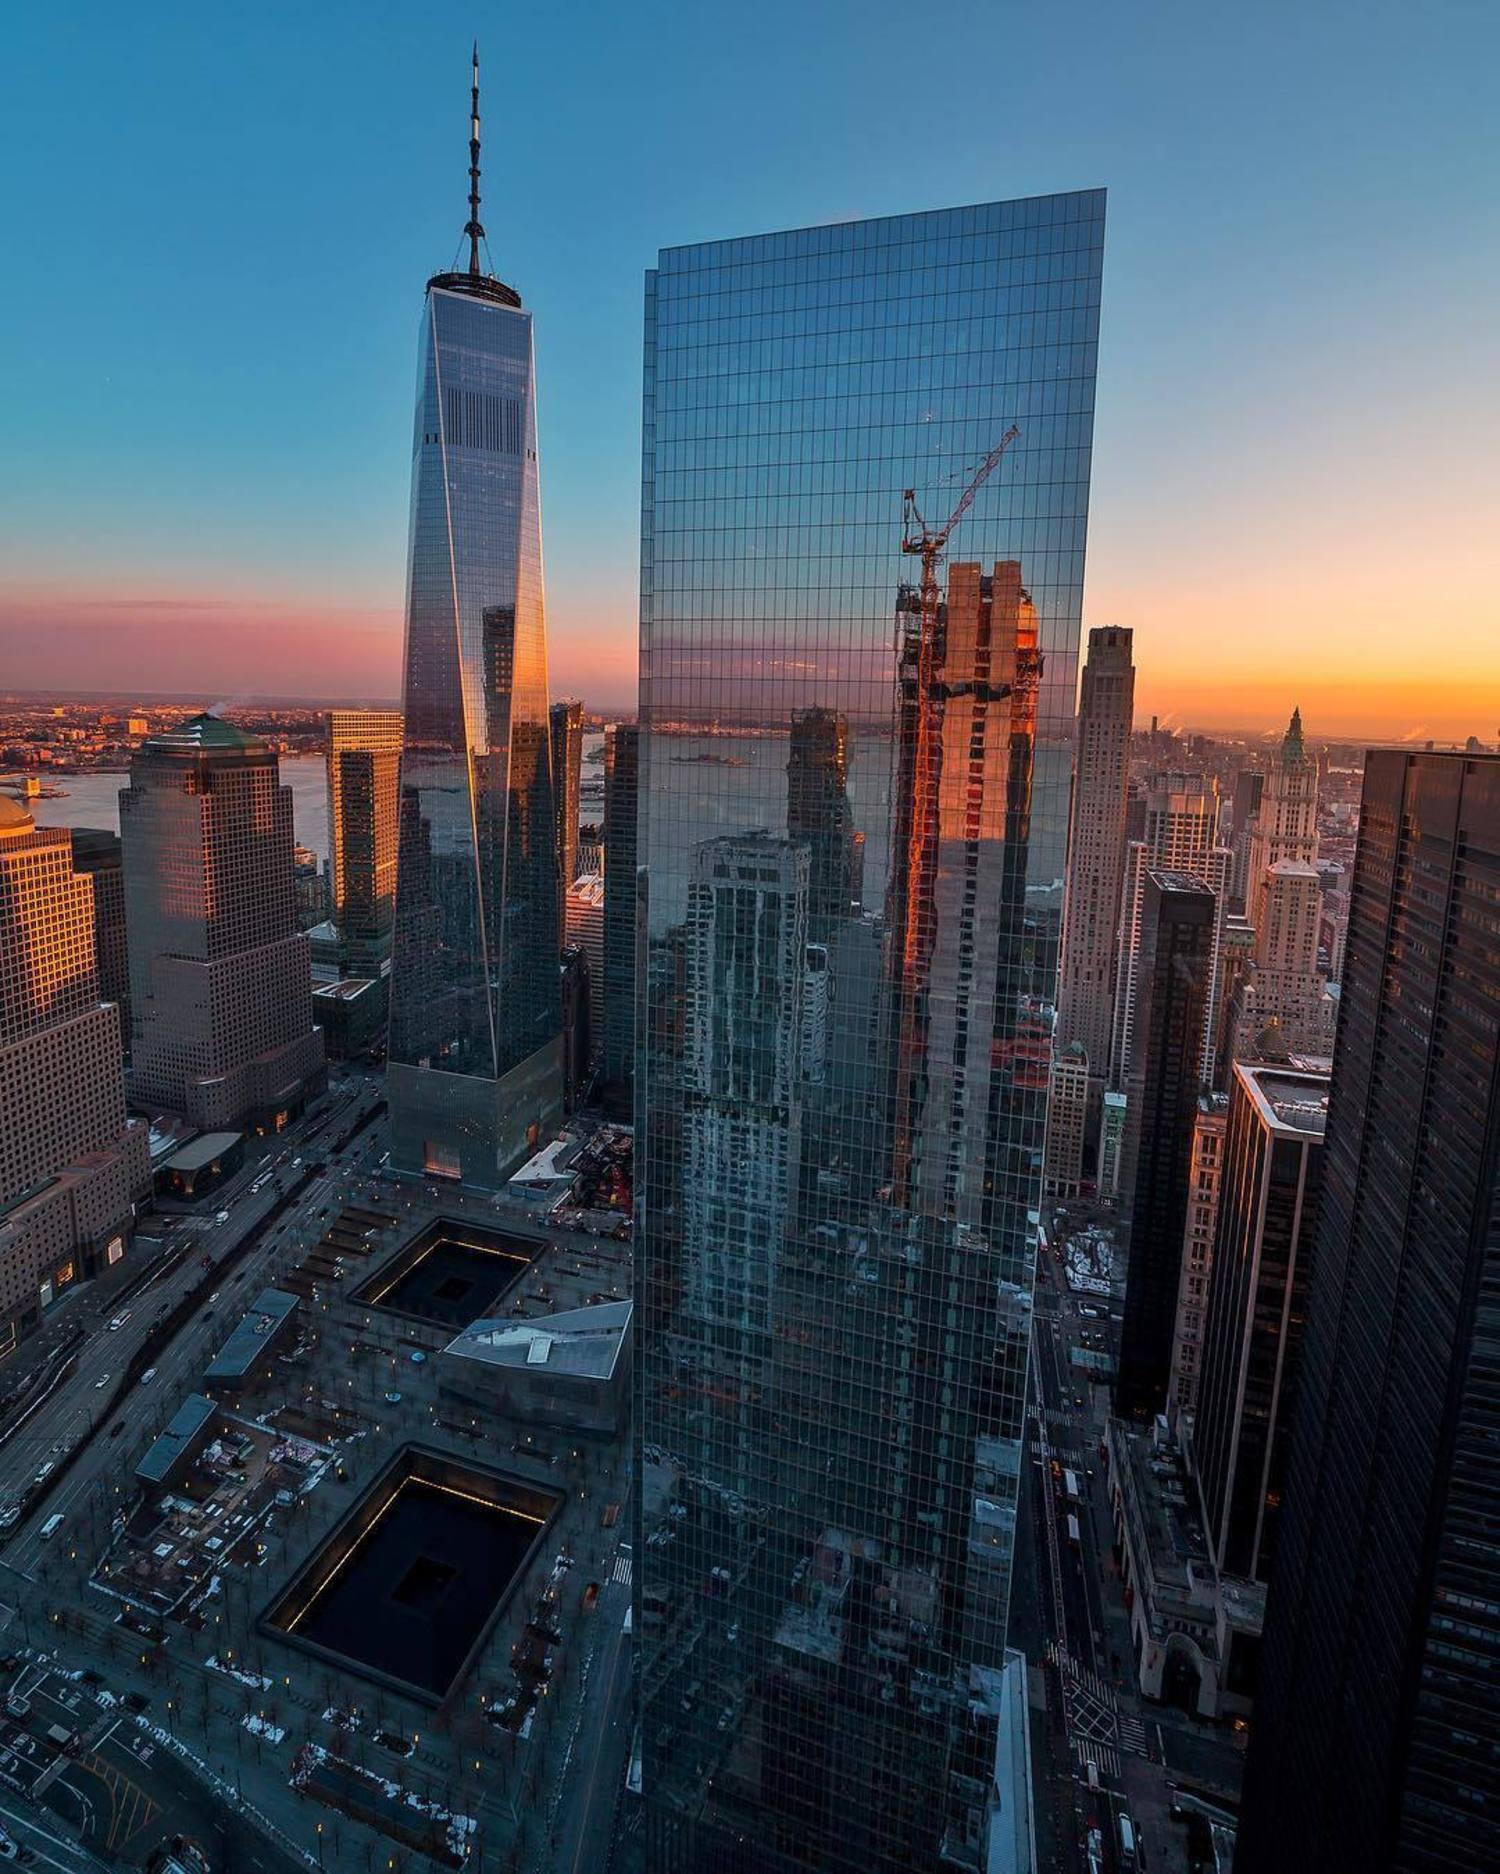 Sunrise over Lower Manhattan